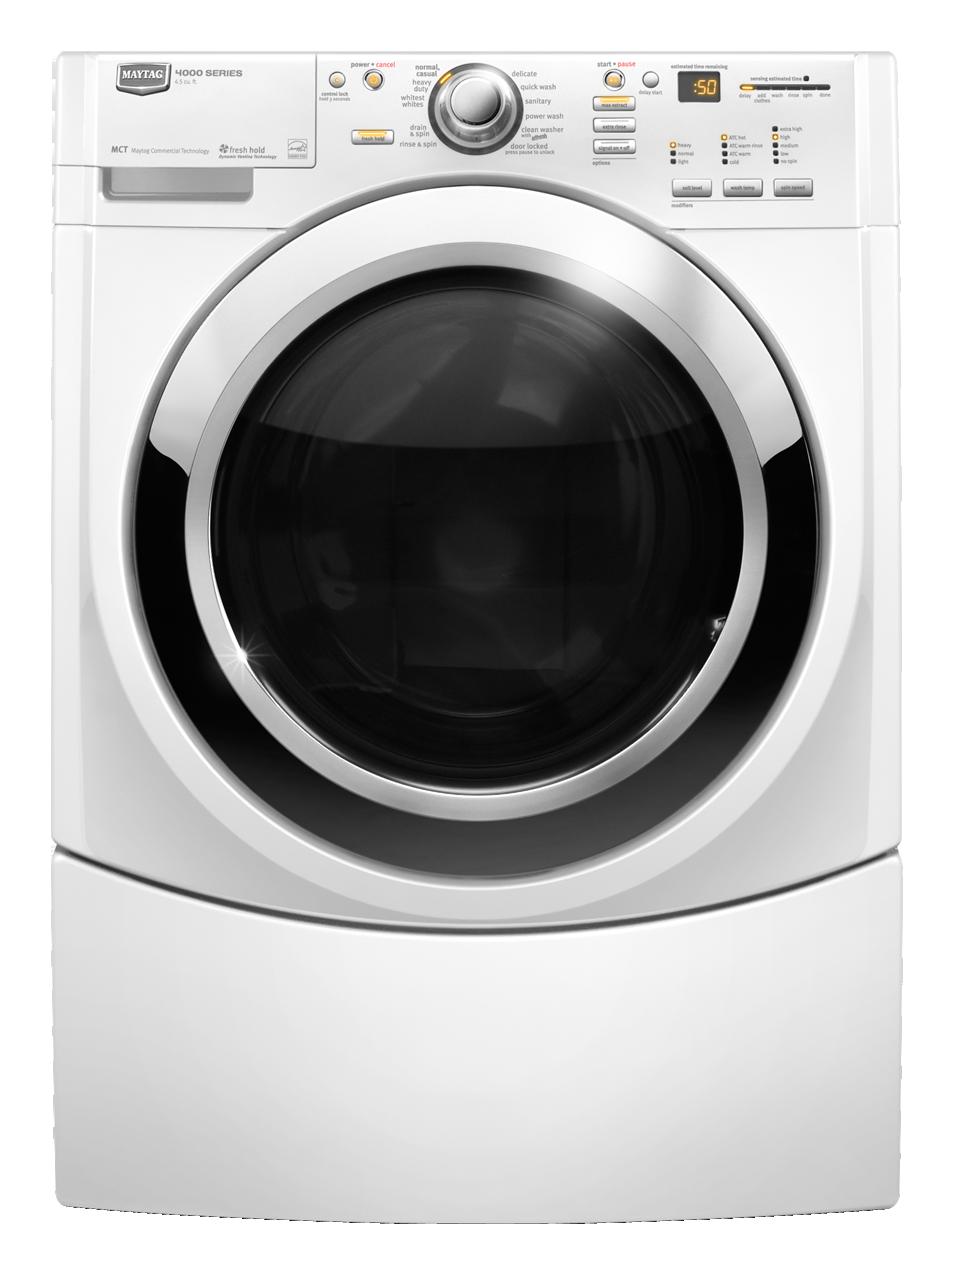 Maytag Washer And Dryer Laundry Room Storage Shelves Laundry